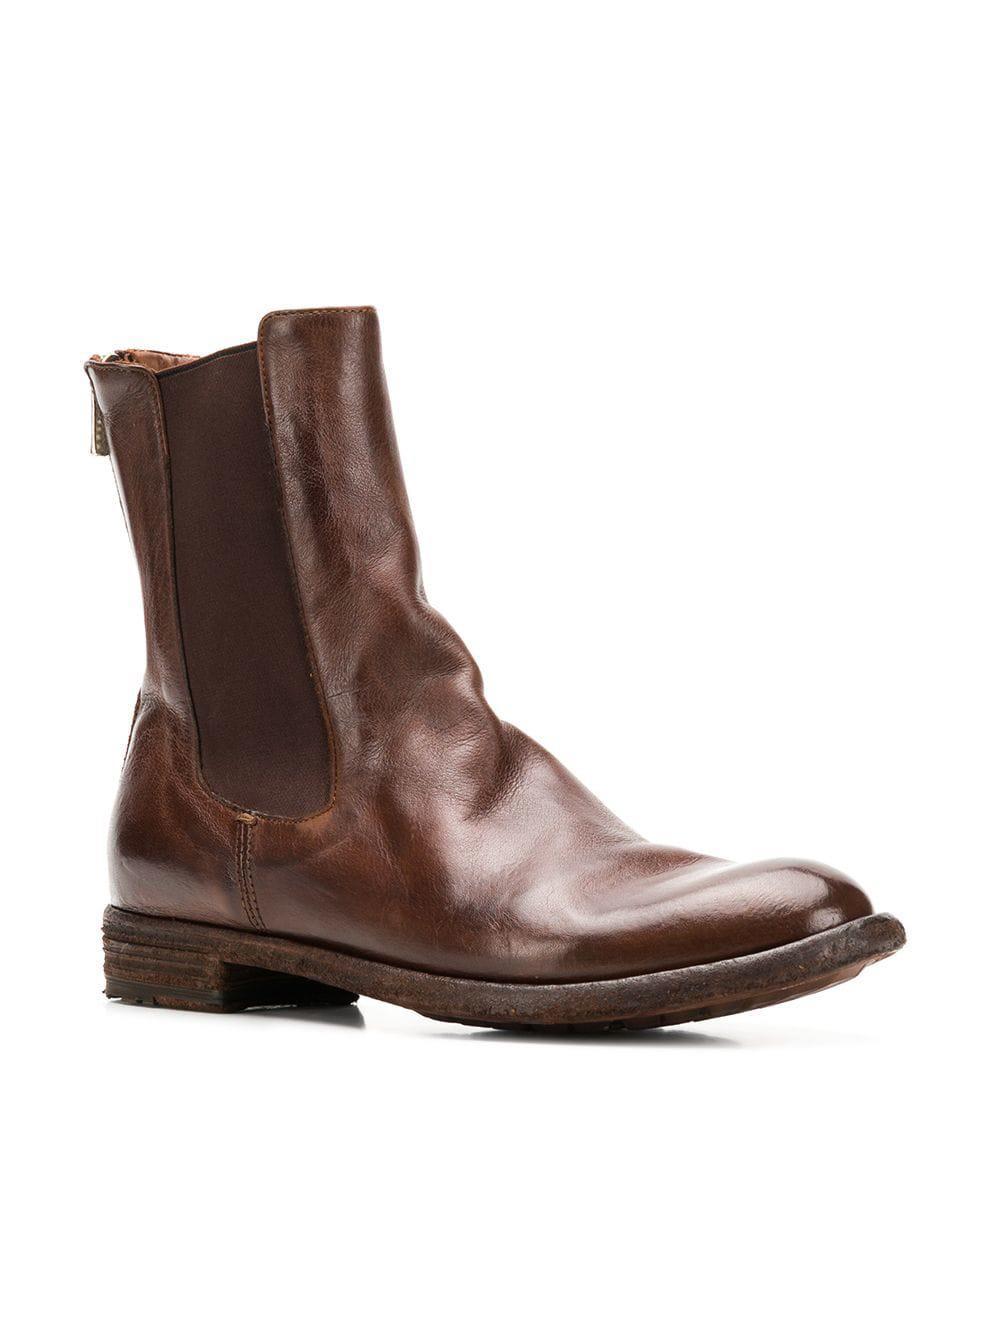 371a0b3da328 Lyst - Officine Creative Lexikon Chelsea Boots in Brown